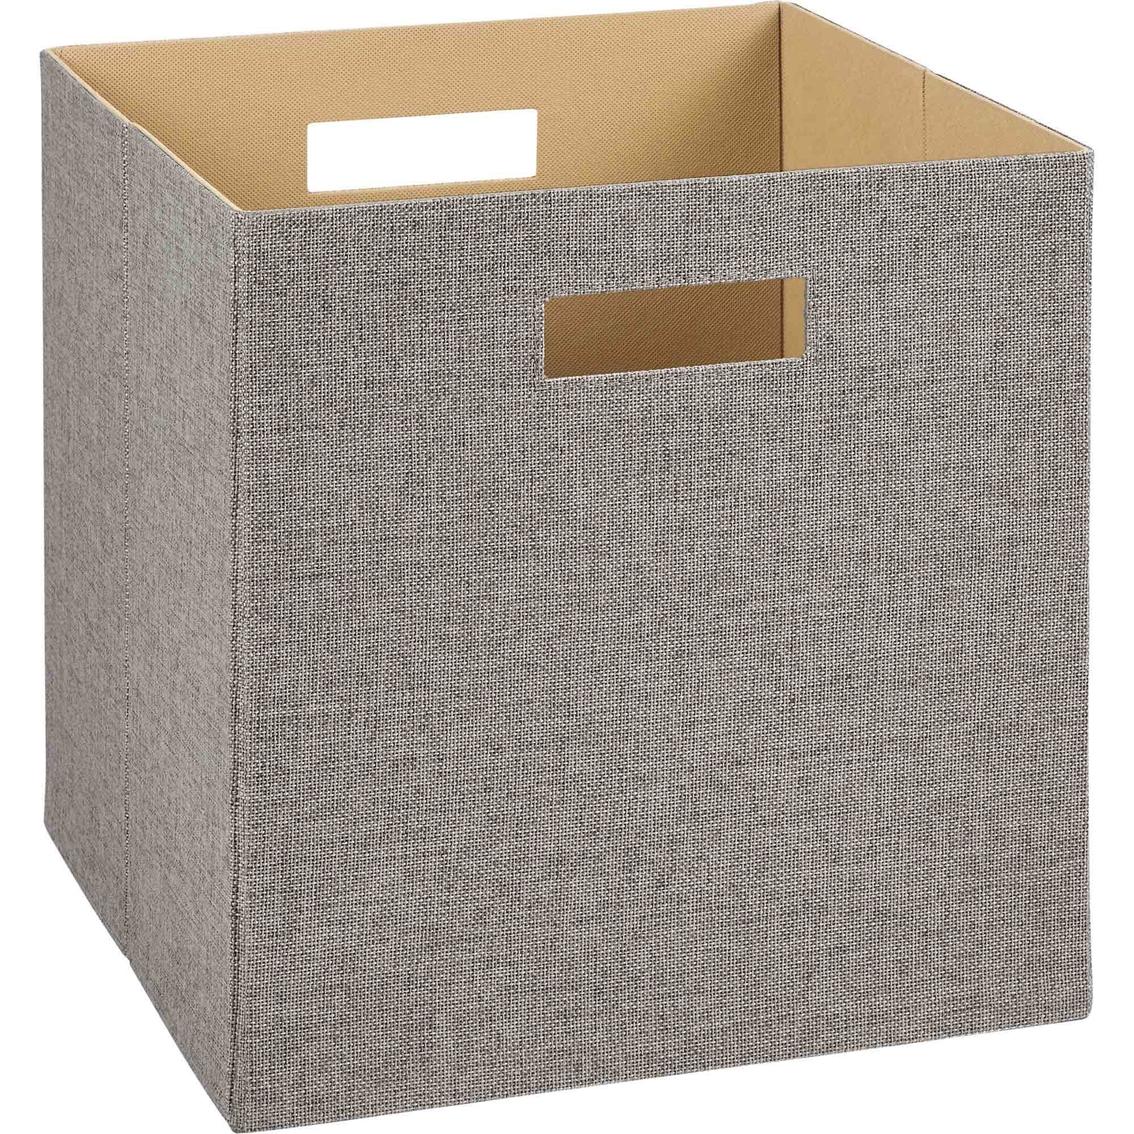 Attrayant ClosetMaid Decorative Storage Fabric Bin